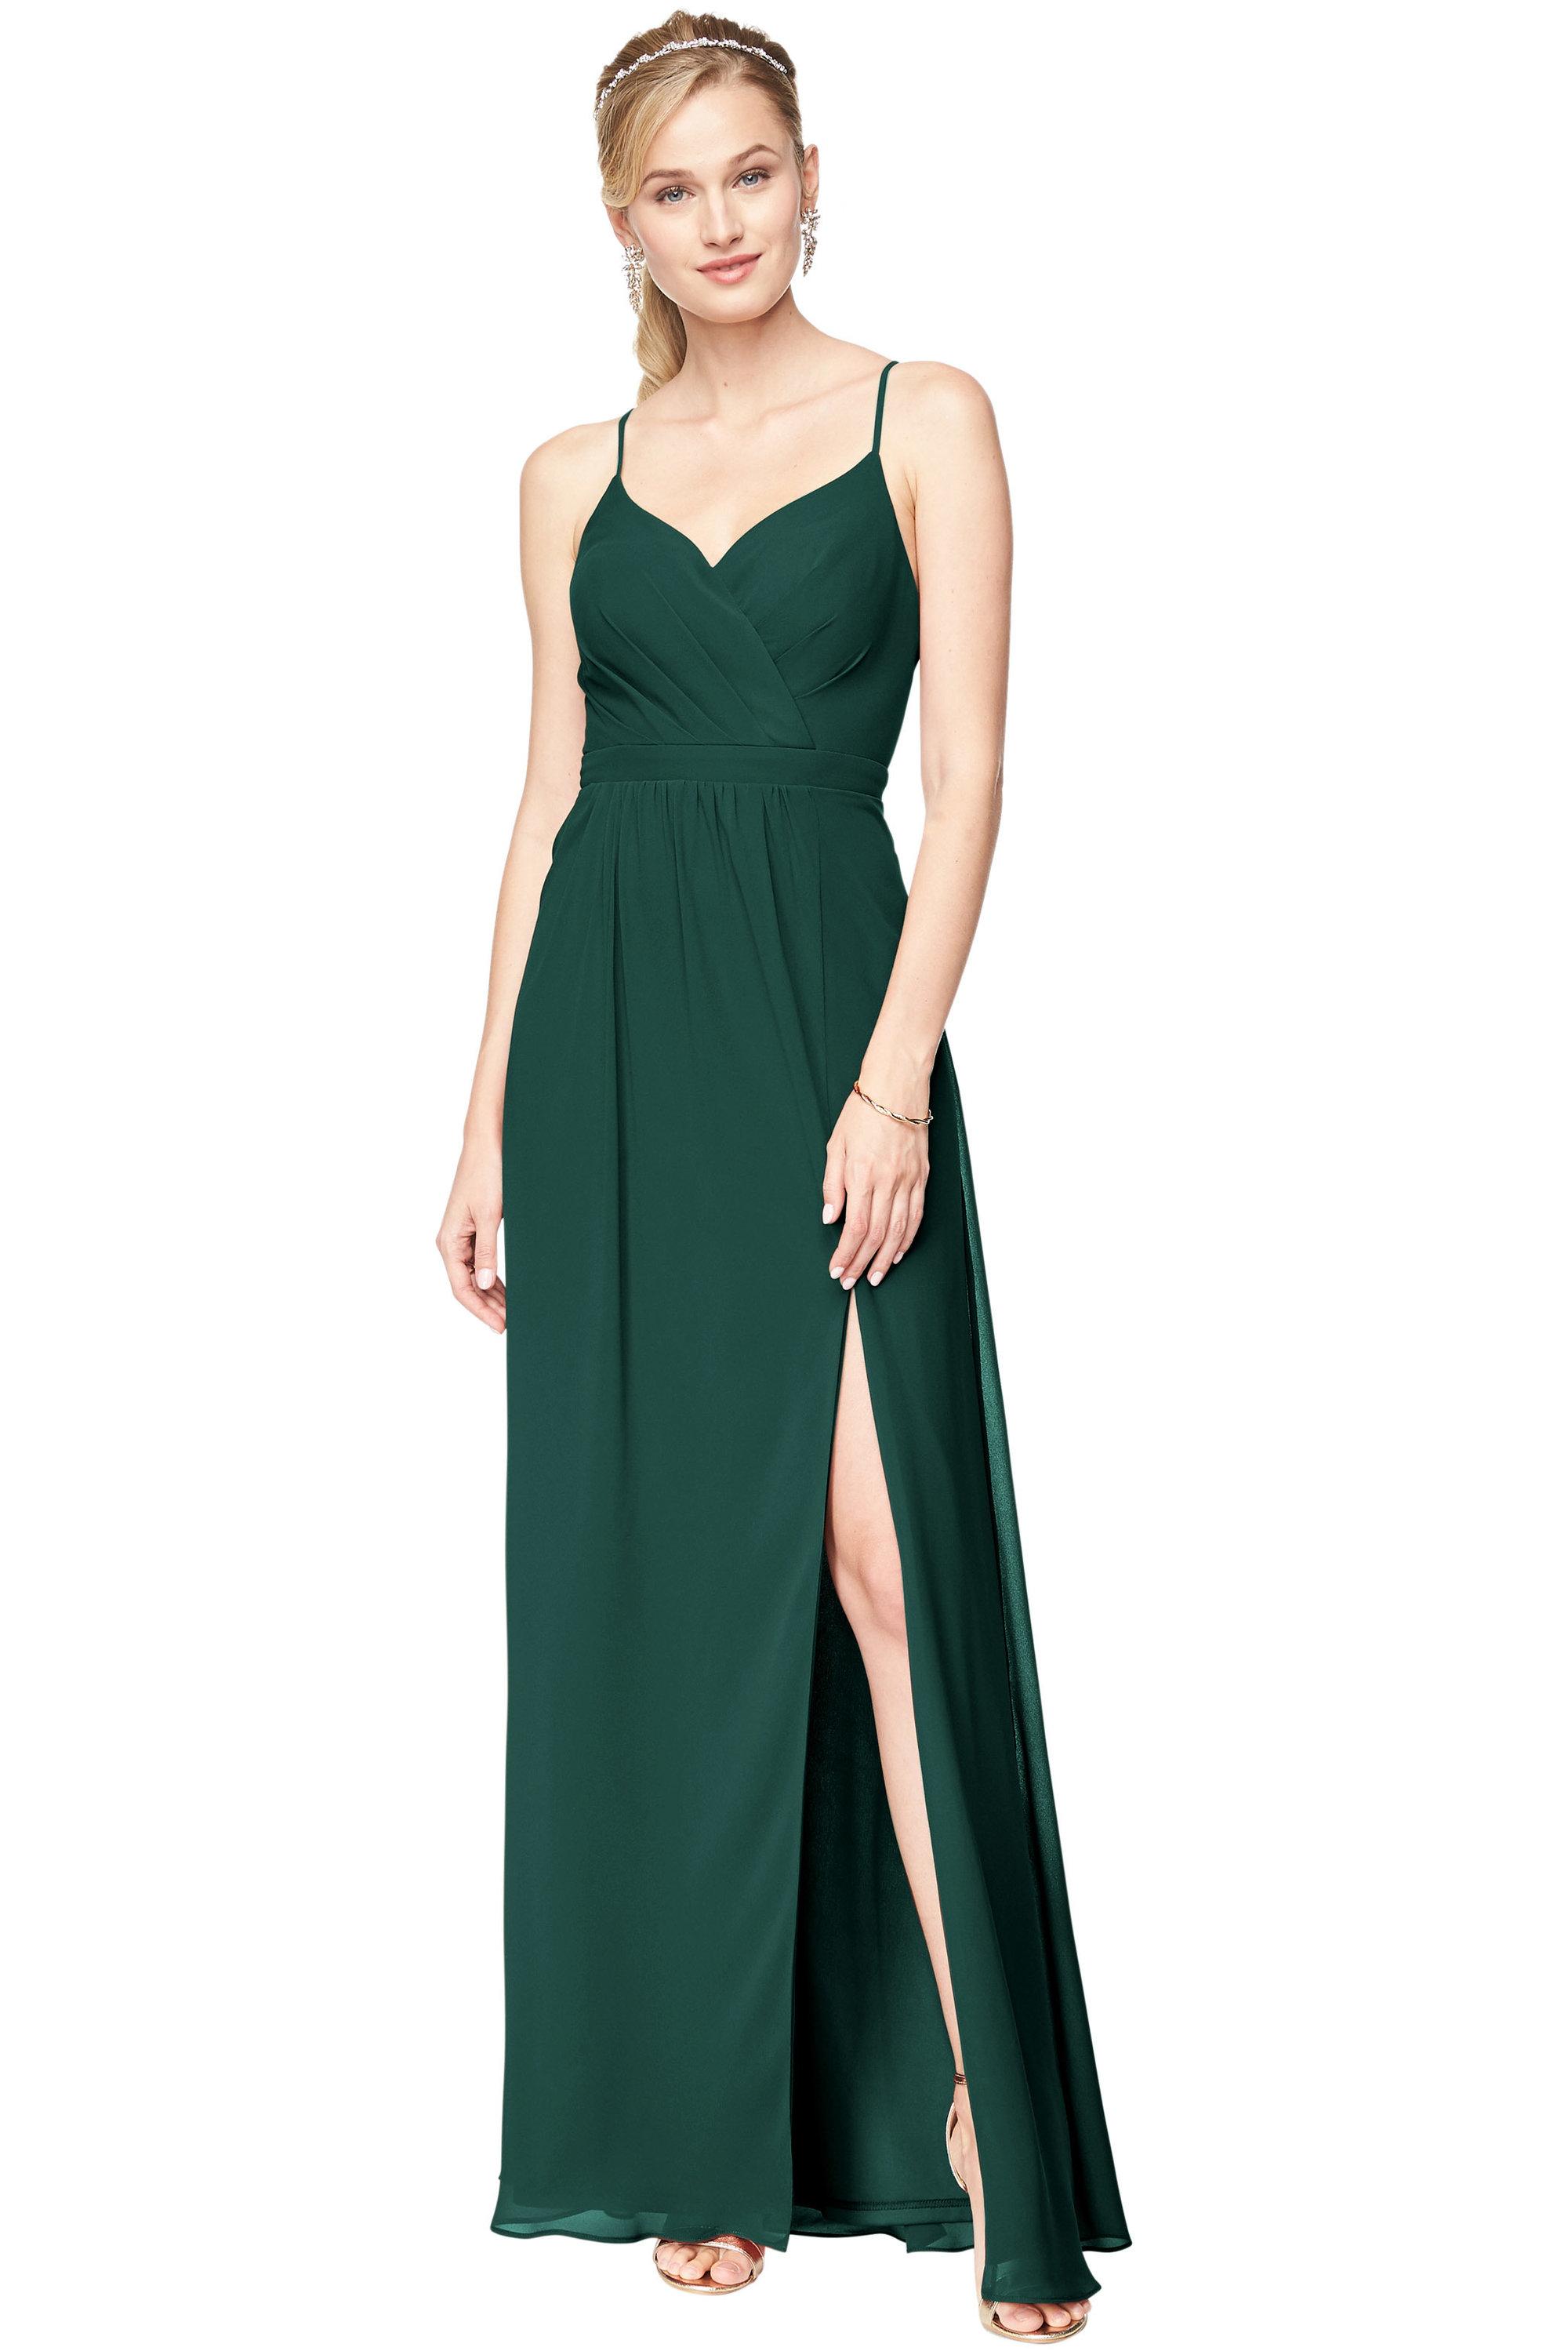 Bill Levkoff EVERGREEN Chiffon Surplice A-Line gown, $178.00 Front